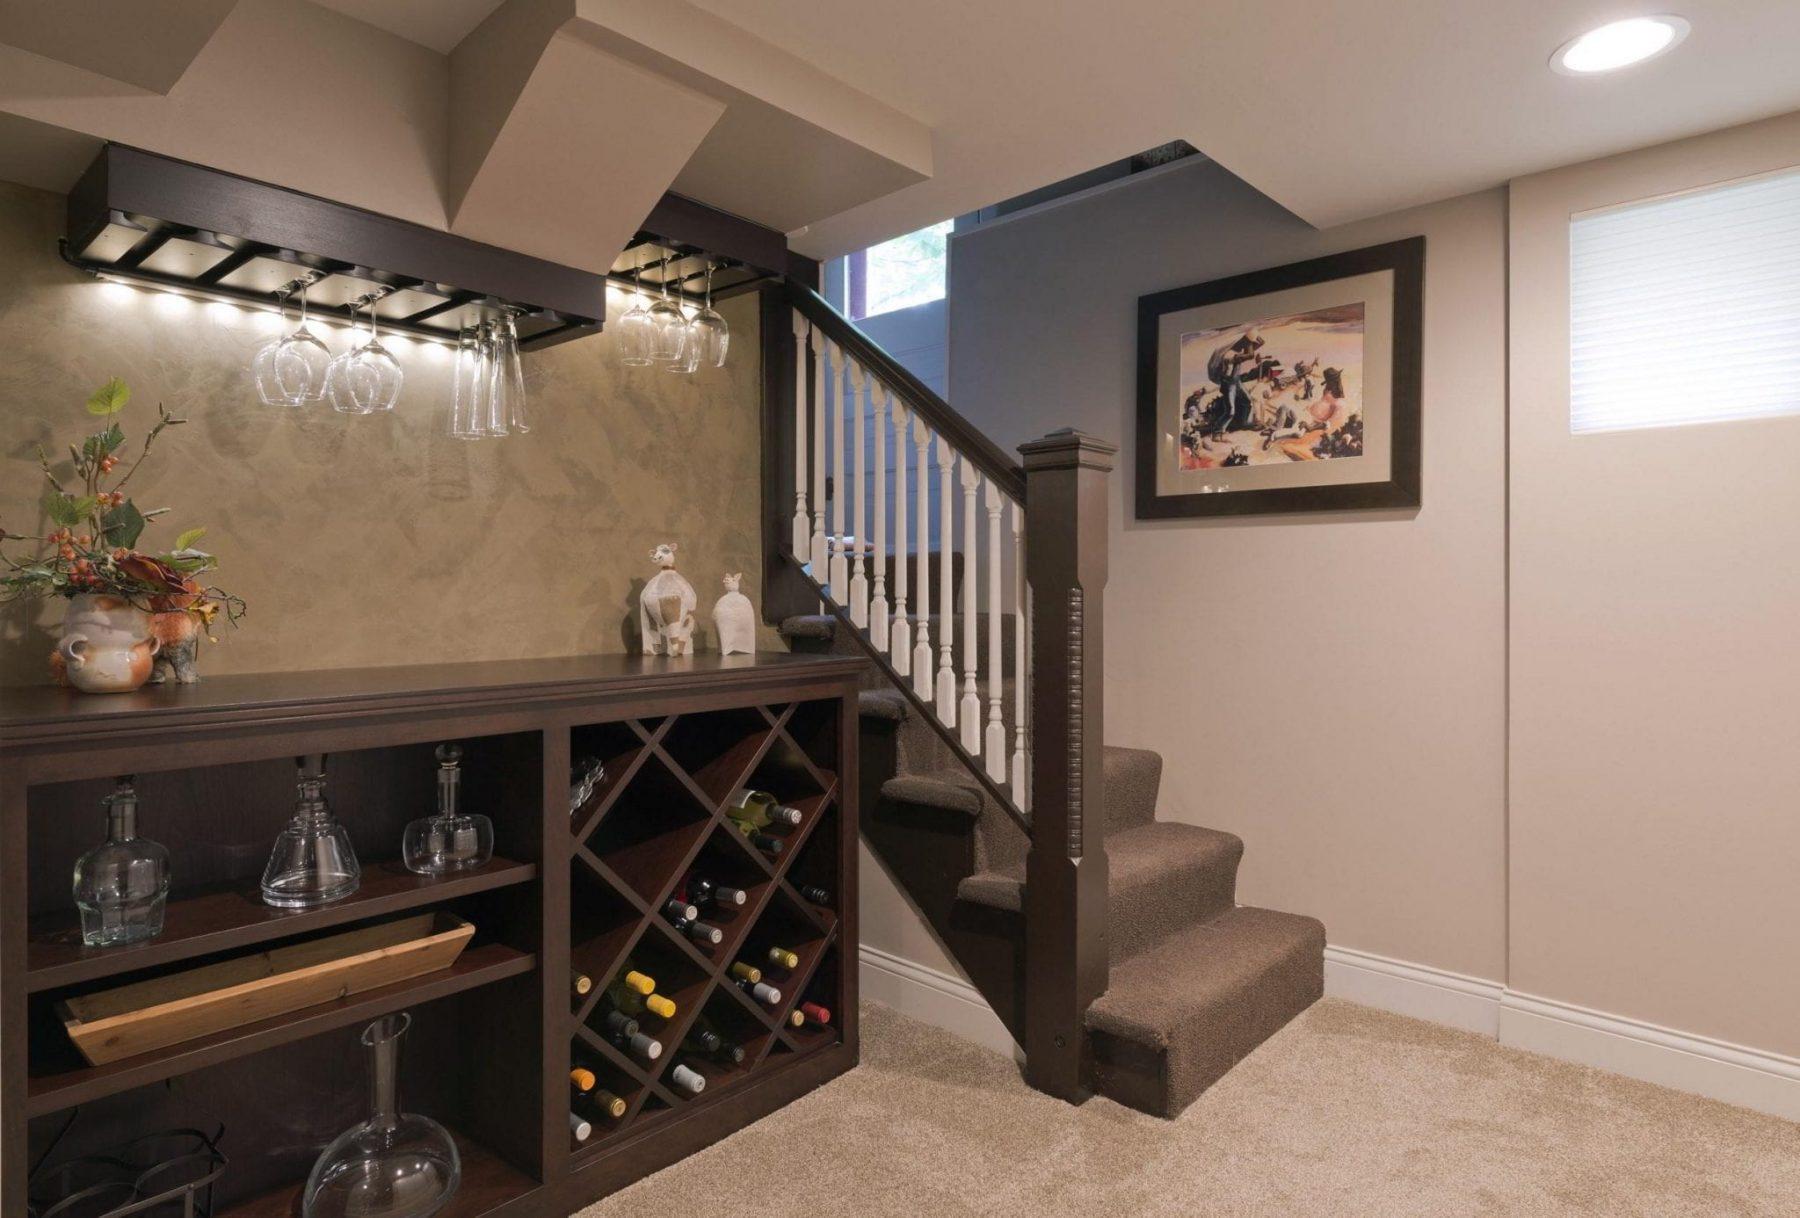 Home Remodeling Interior Design Geneva IL | Basement Renovations